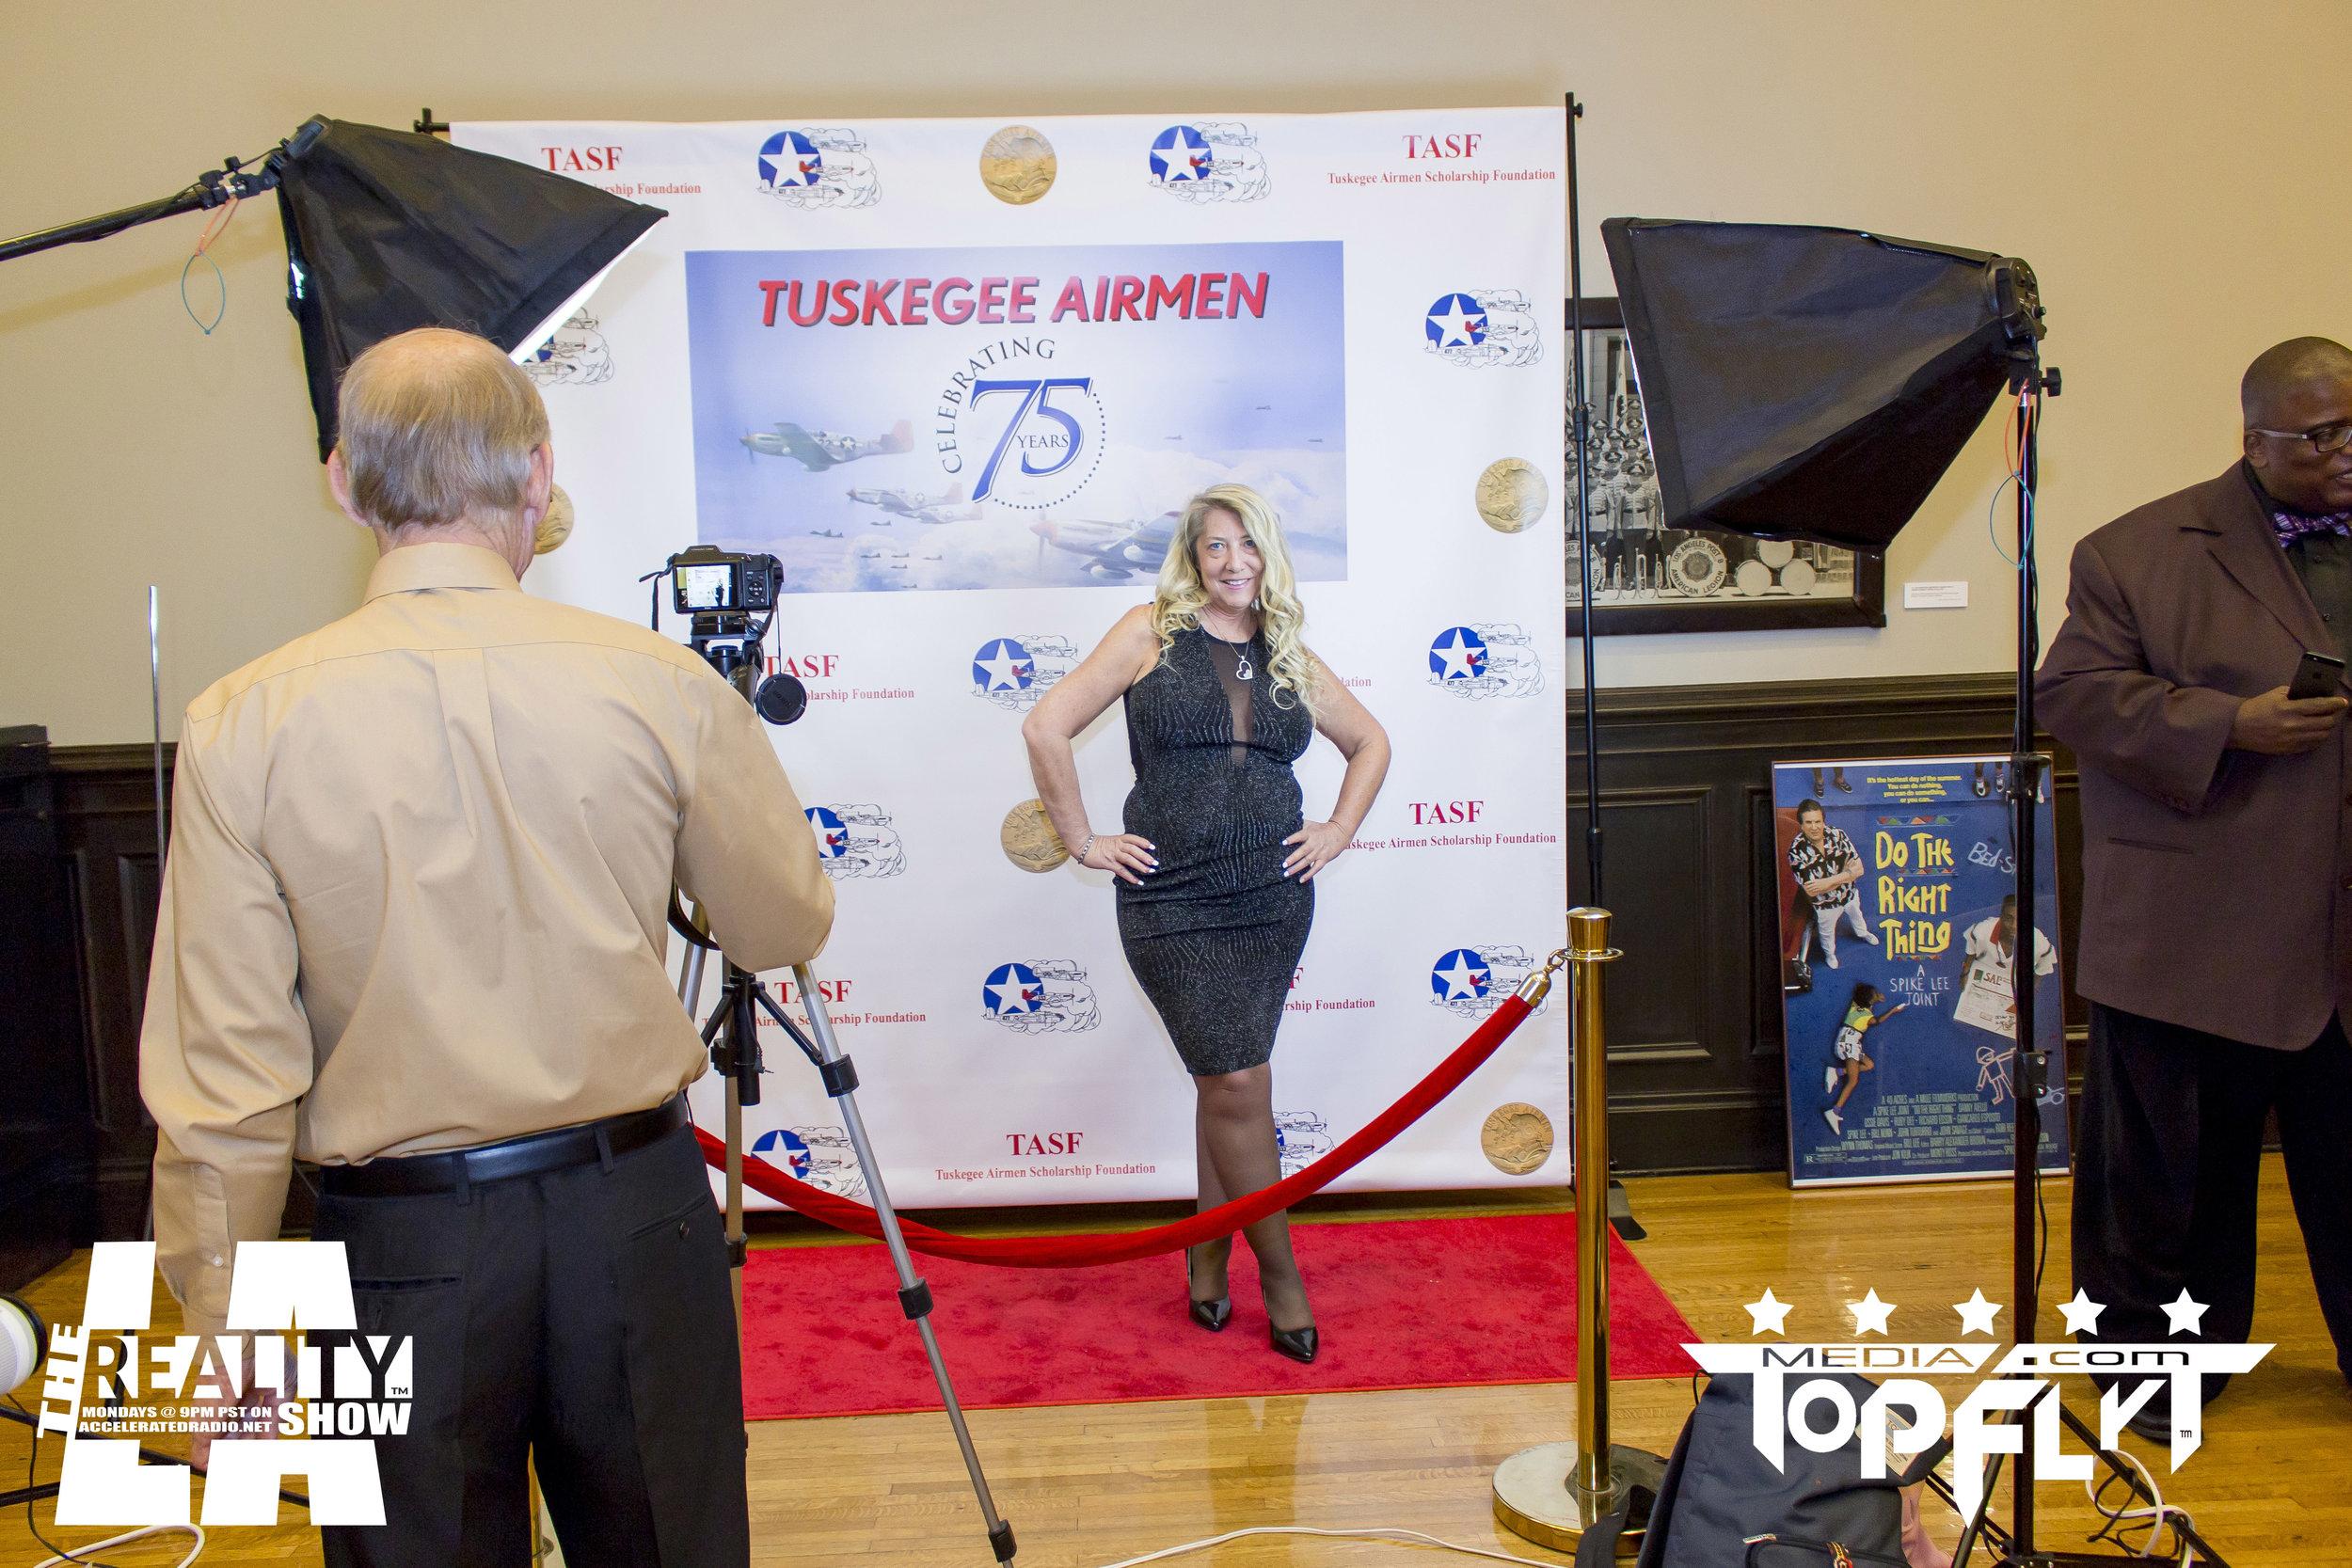 The Reality Show LA - Tuskegee Airmen 75th Anniversary VIP Reception_50.jpg